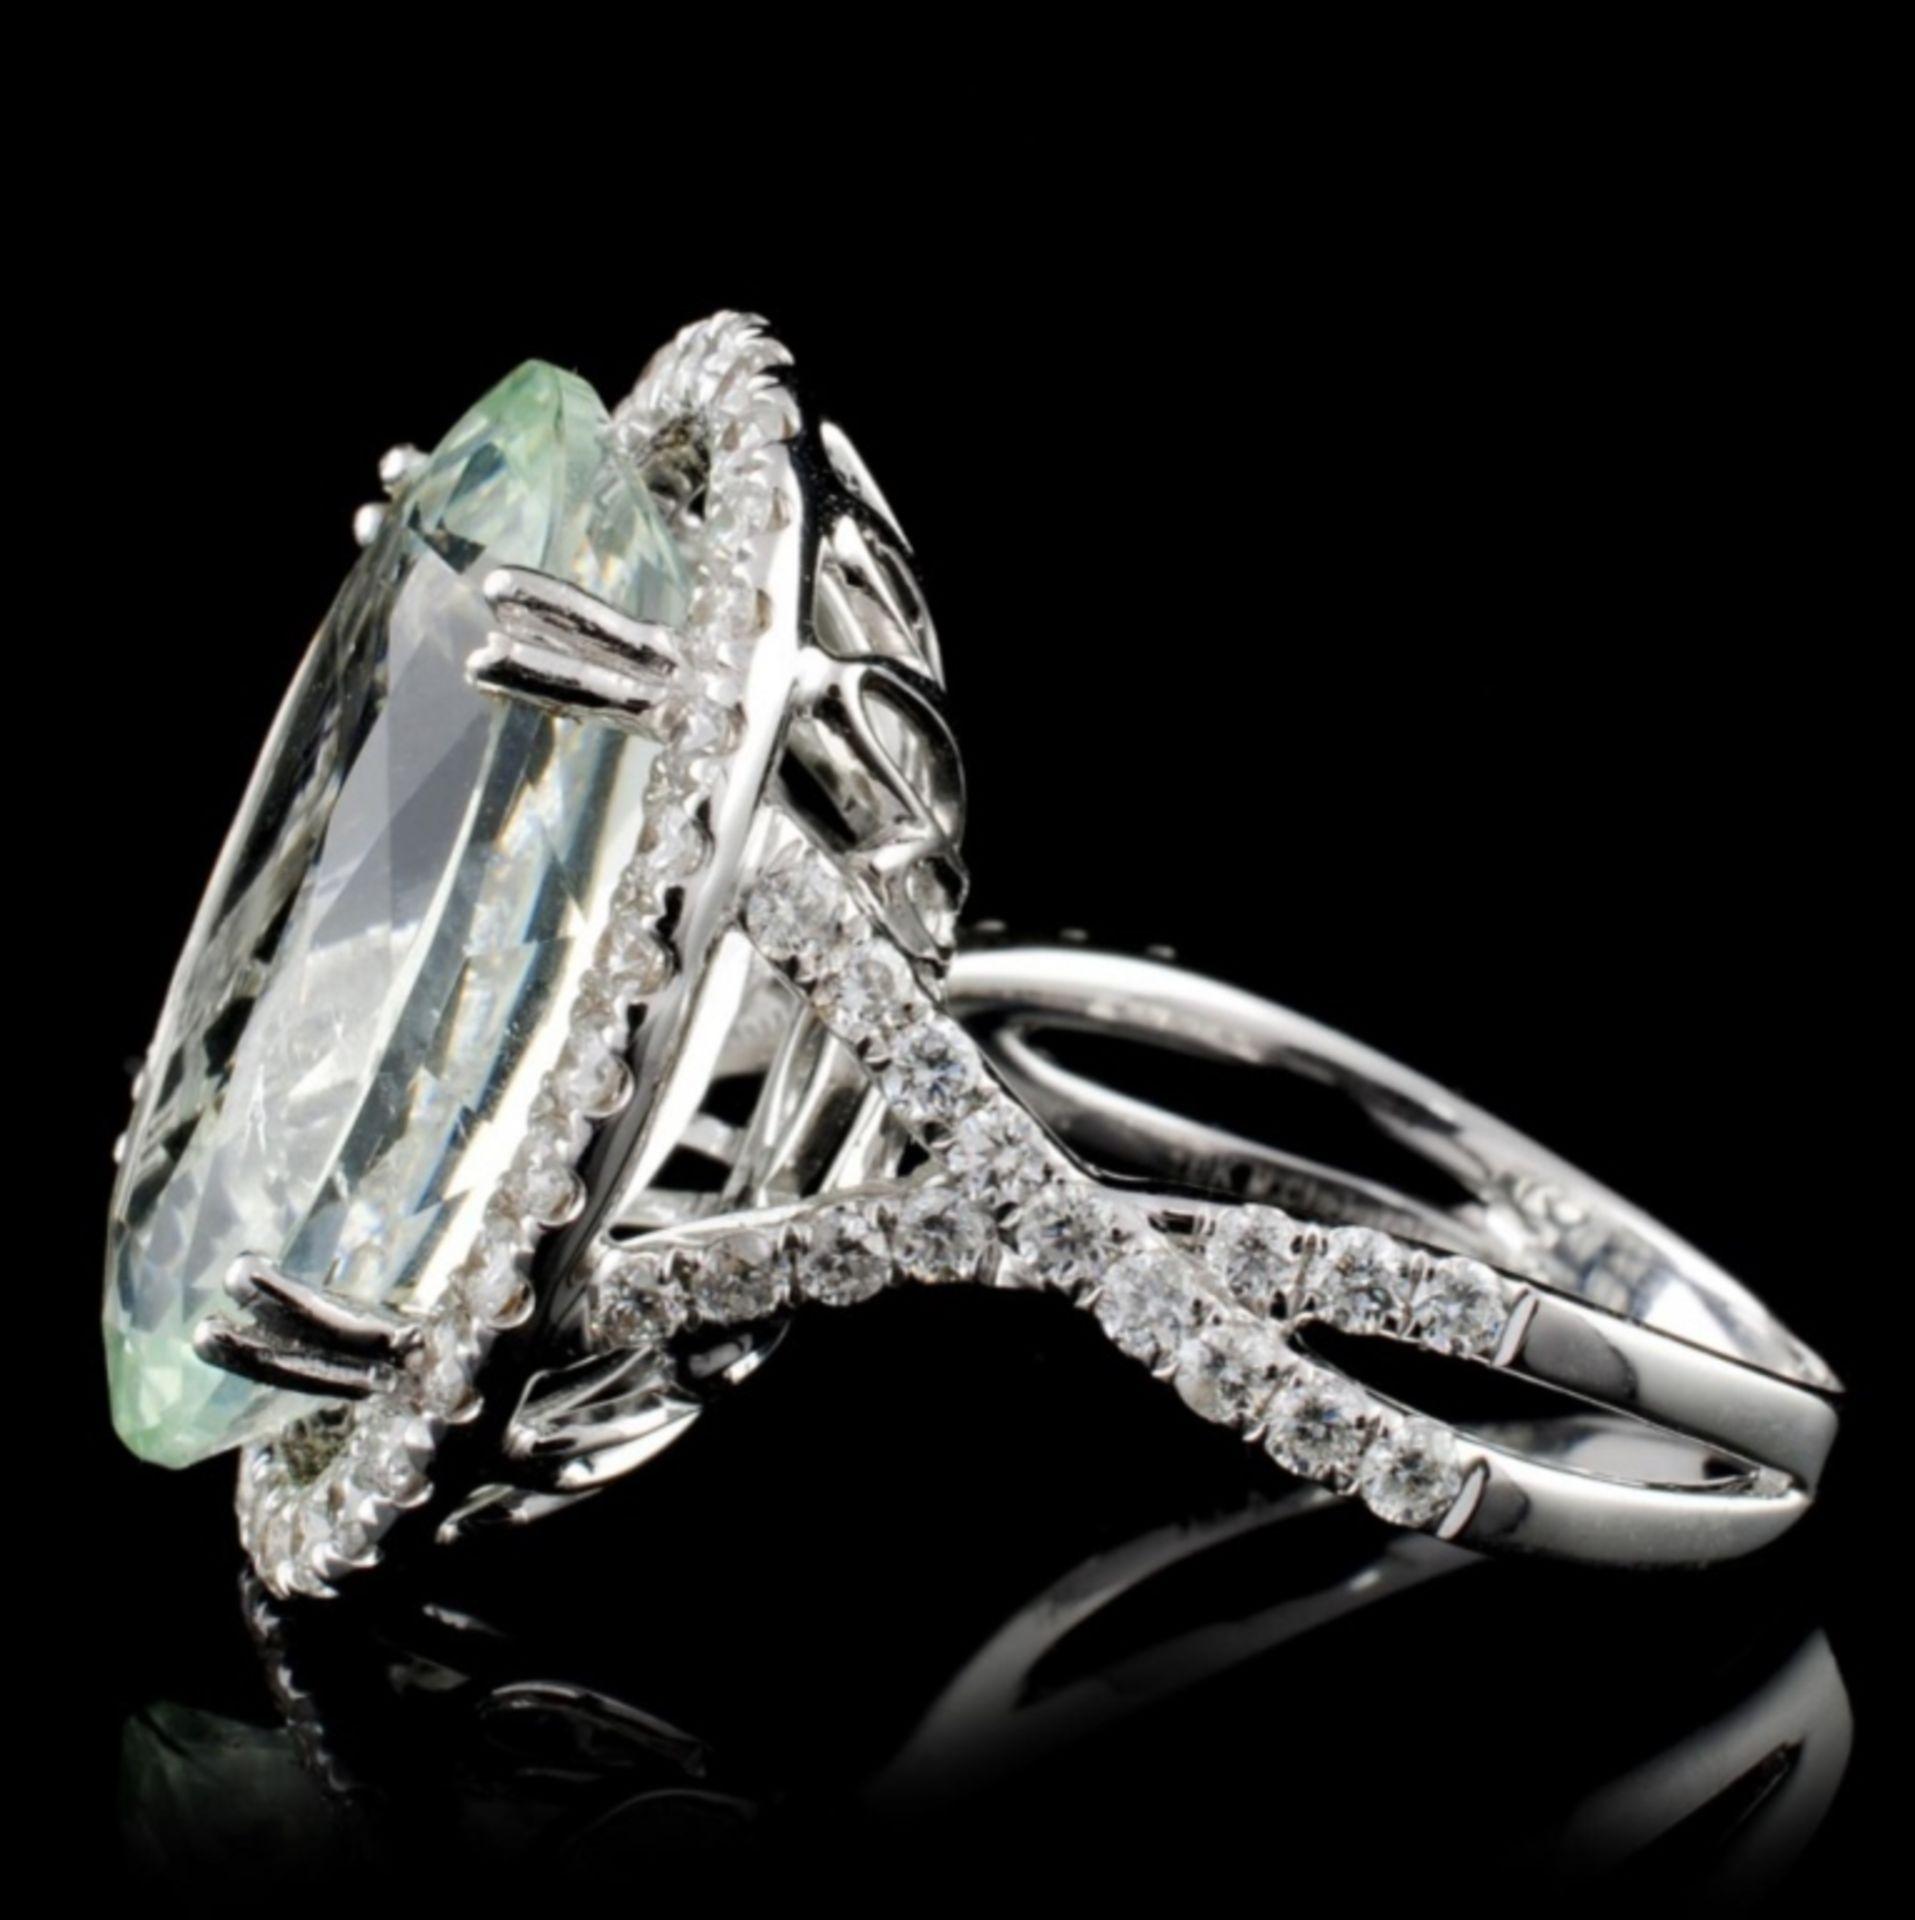 18K Gold 10.00ct Aquamarine & 0.91ct Diamond Ring - Image 3 of 4